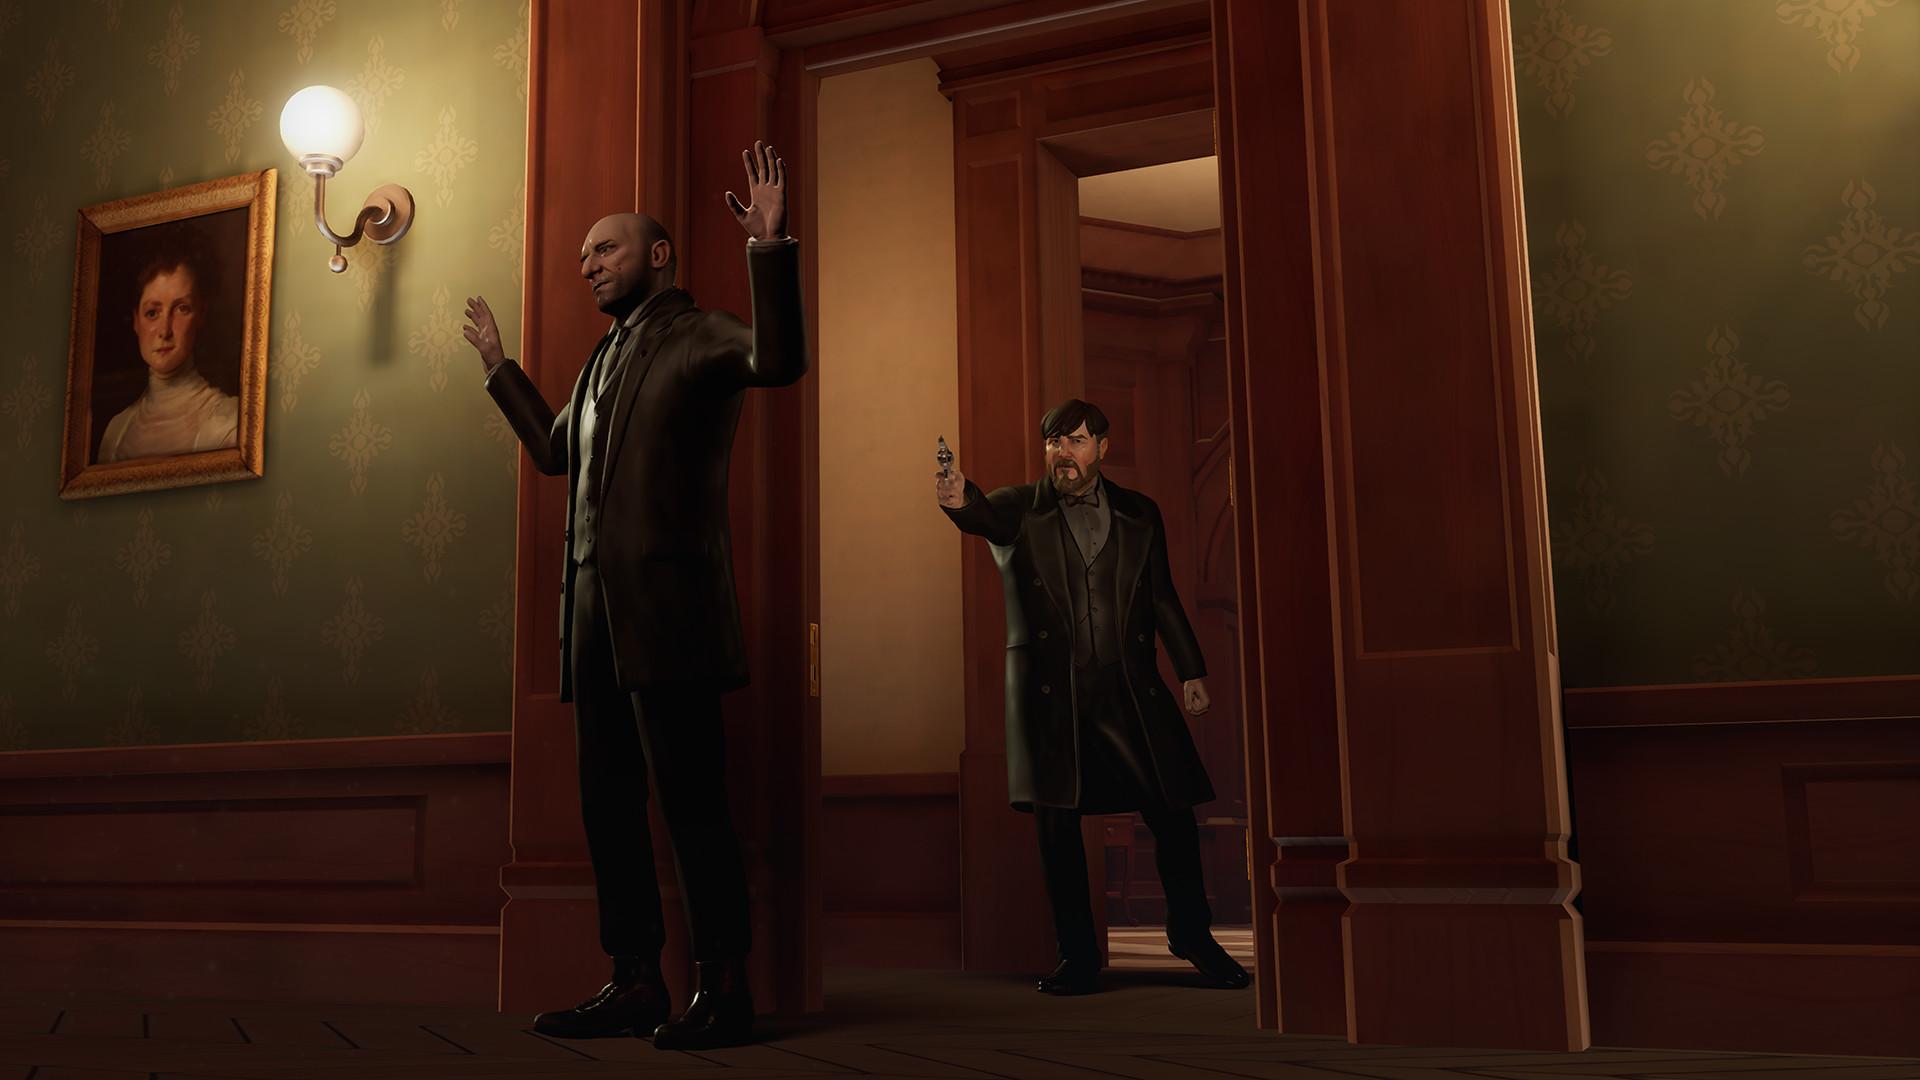 Die besten VR Spiele: The Invisible Hours